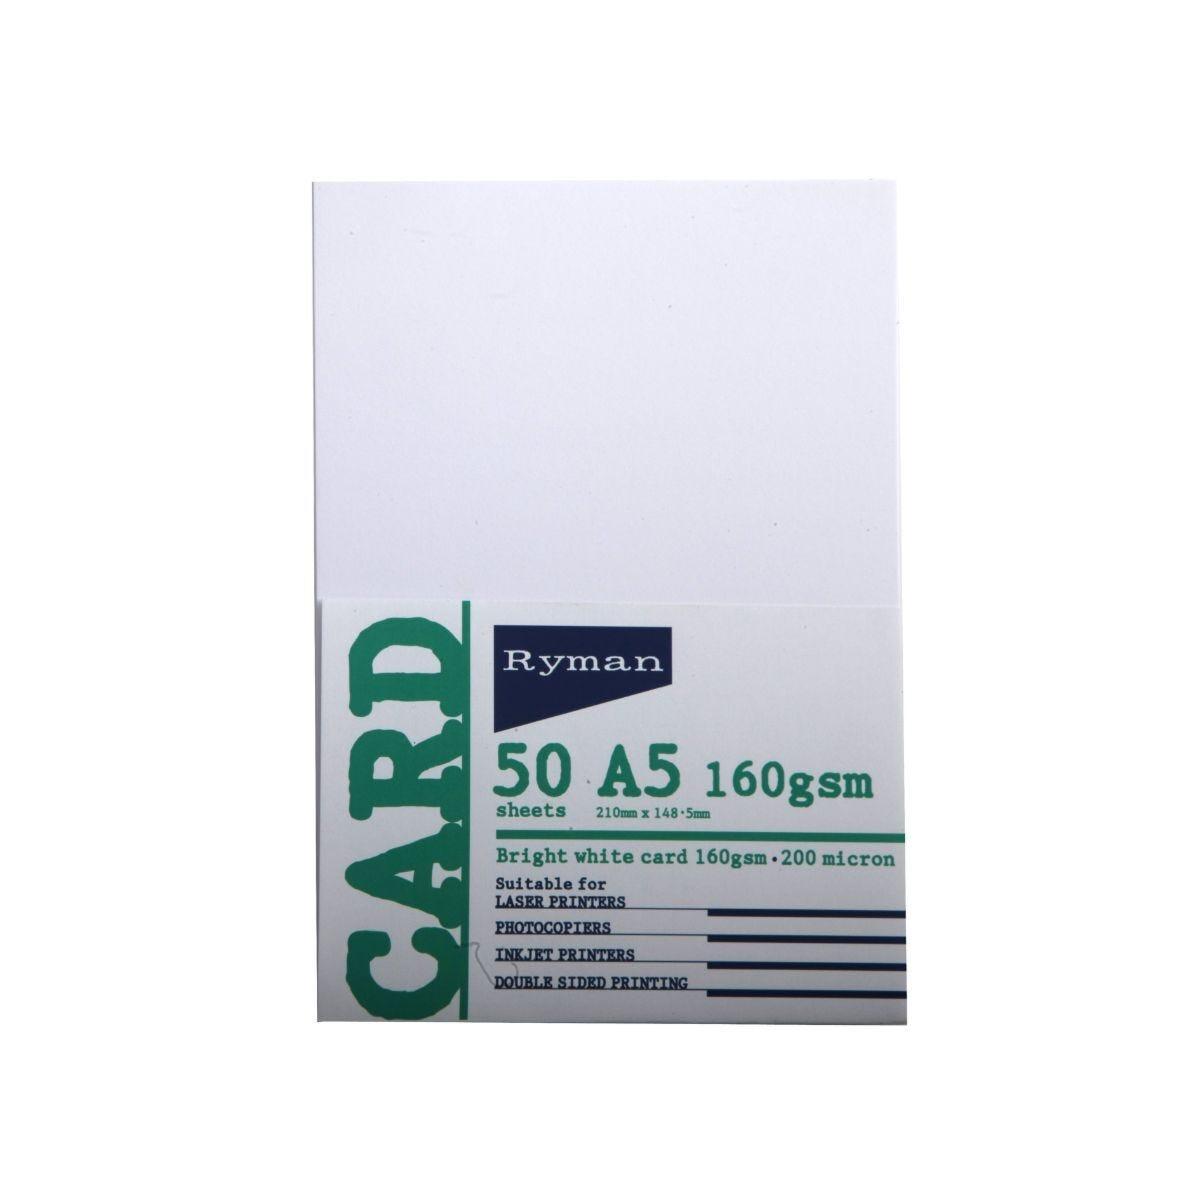 Ryman Card A5 160gsm 50 Sheets White